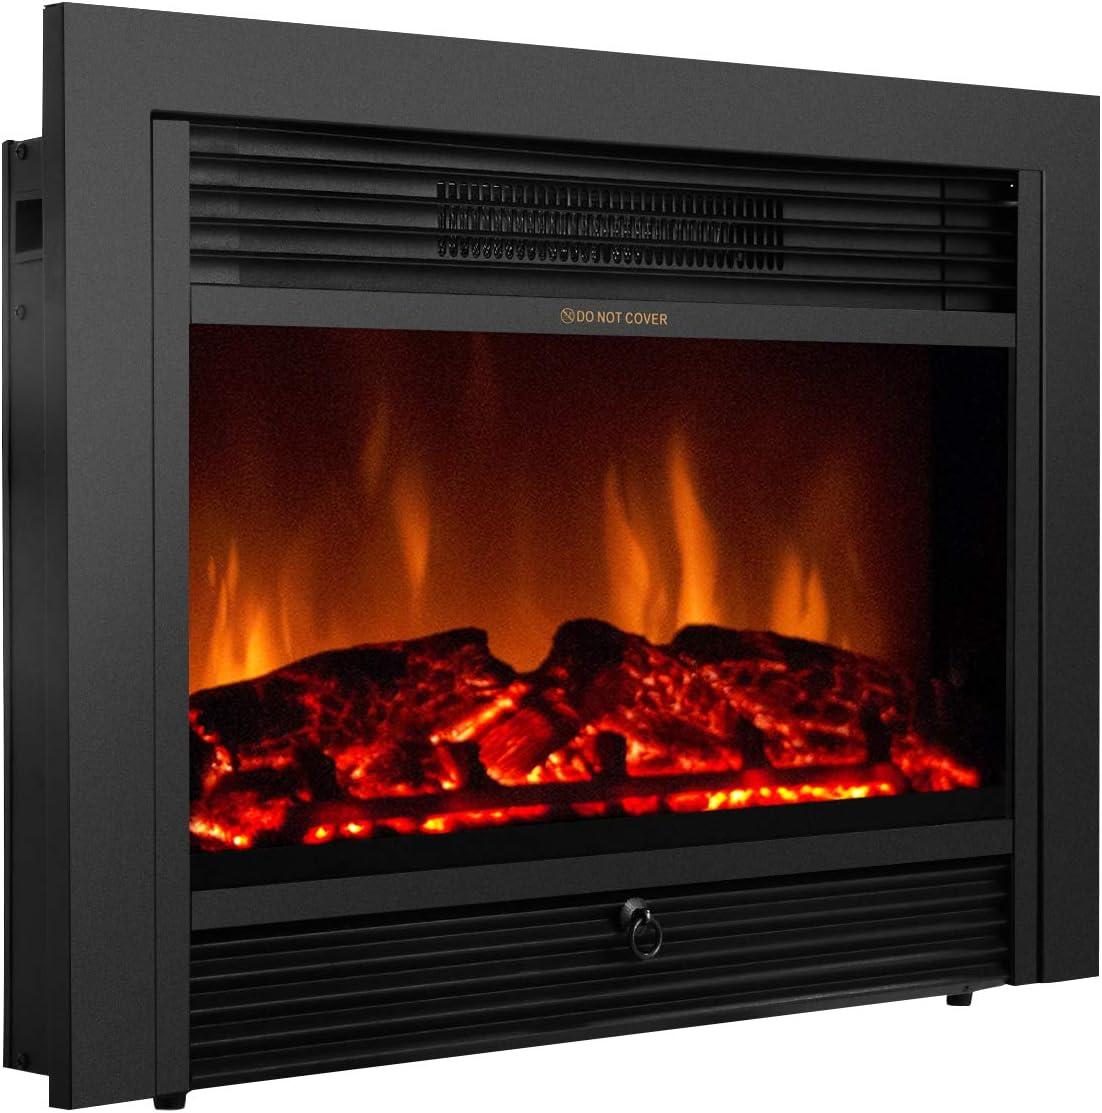 Amazon Com Giantex 28 5 Electric Fireplace Insert Recessed